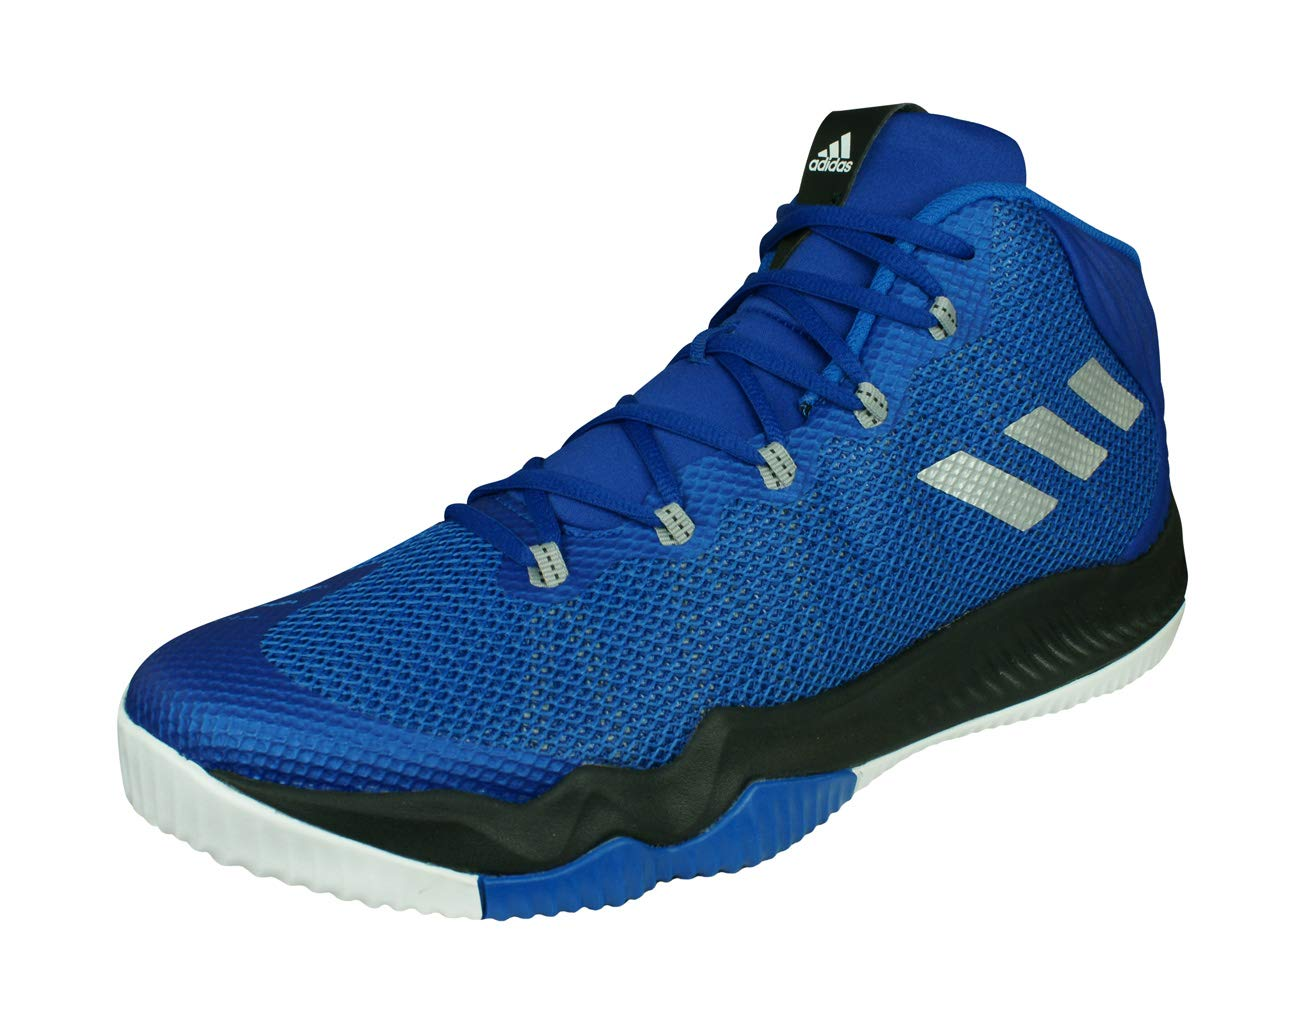 Adidas Crazy Basketballschuhe Hustle Herren Blaureauni Plamet QCrtshd